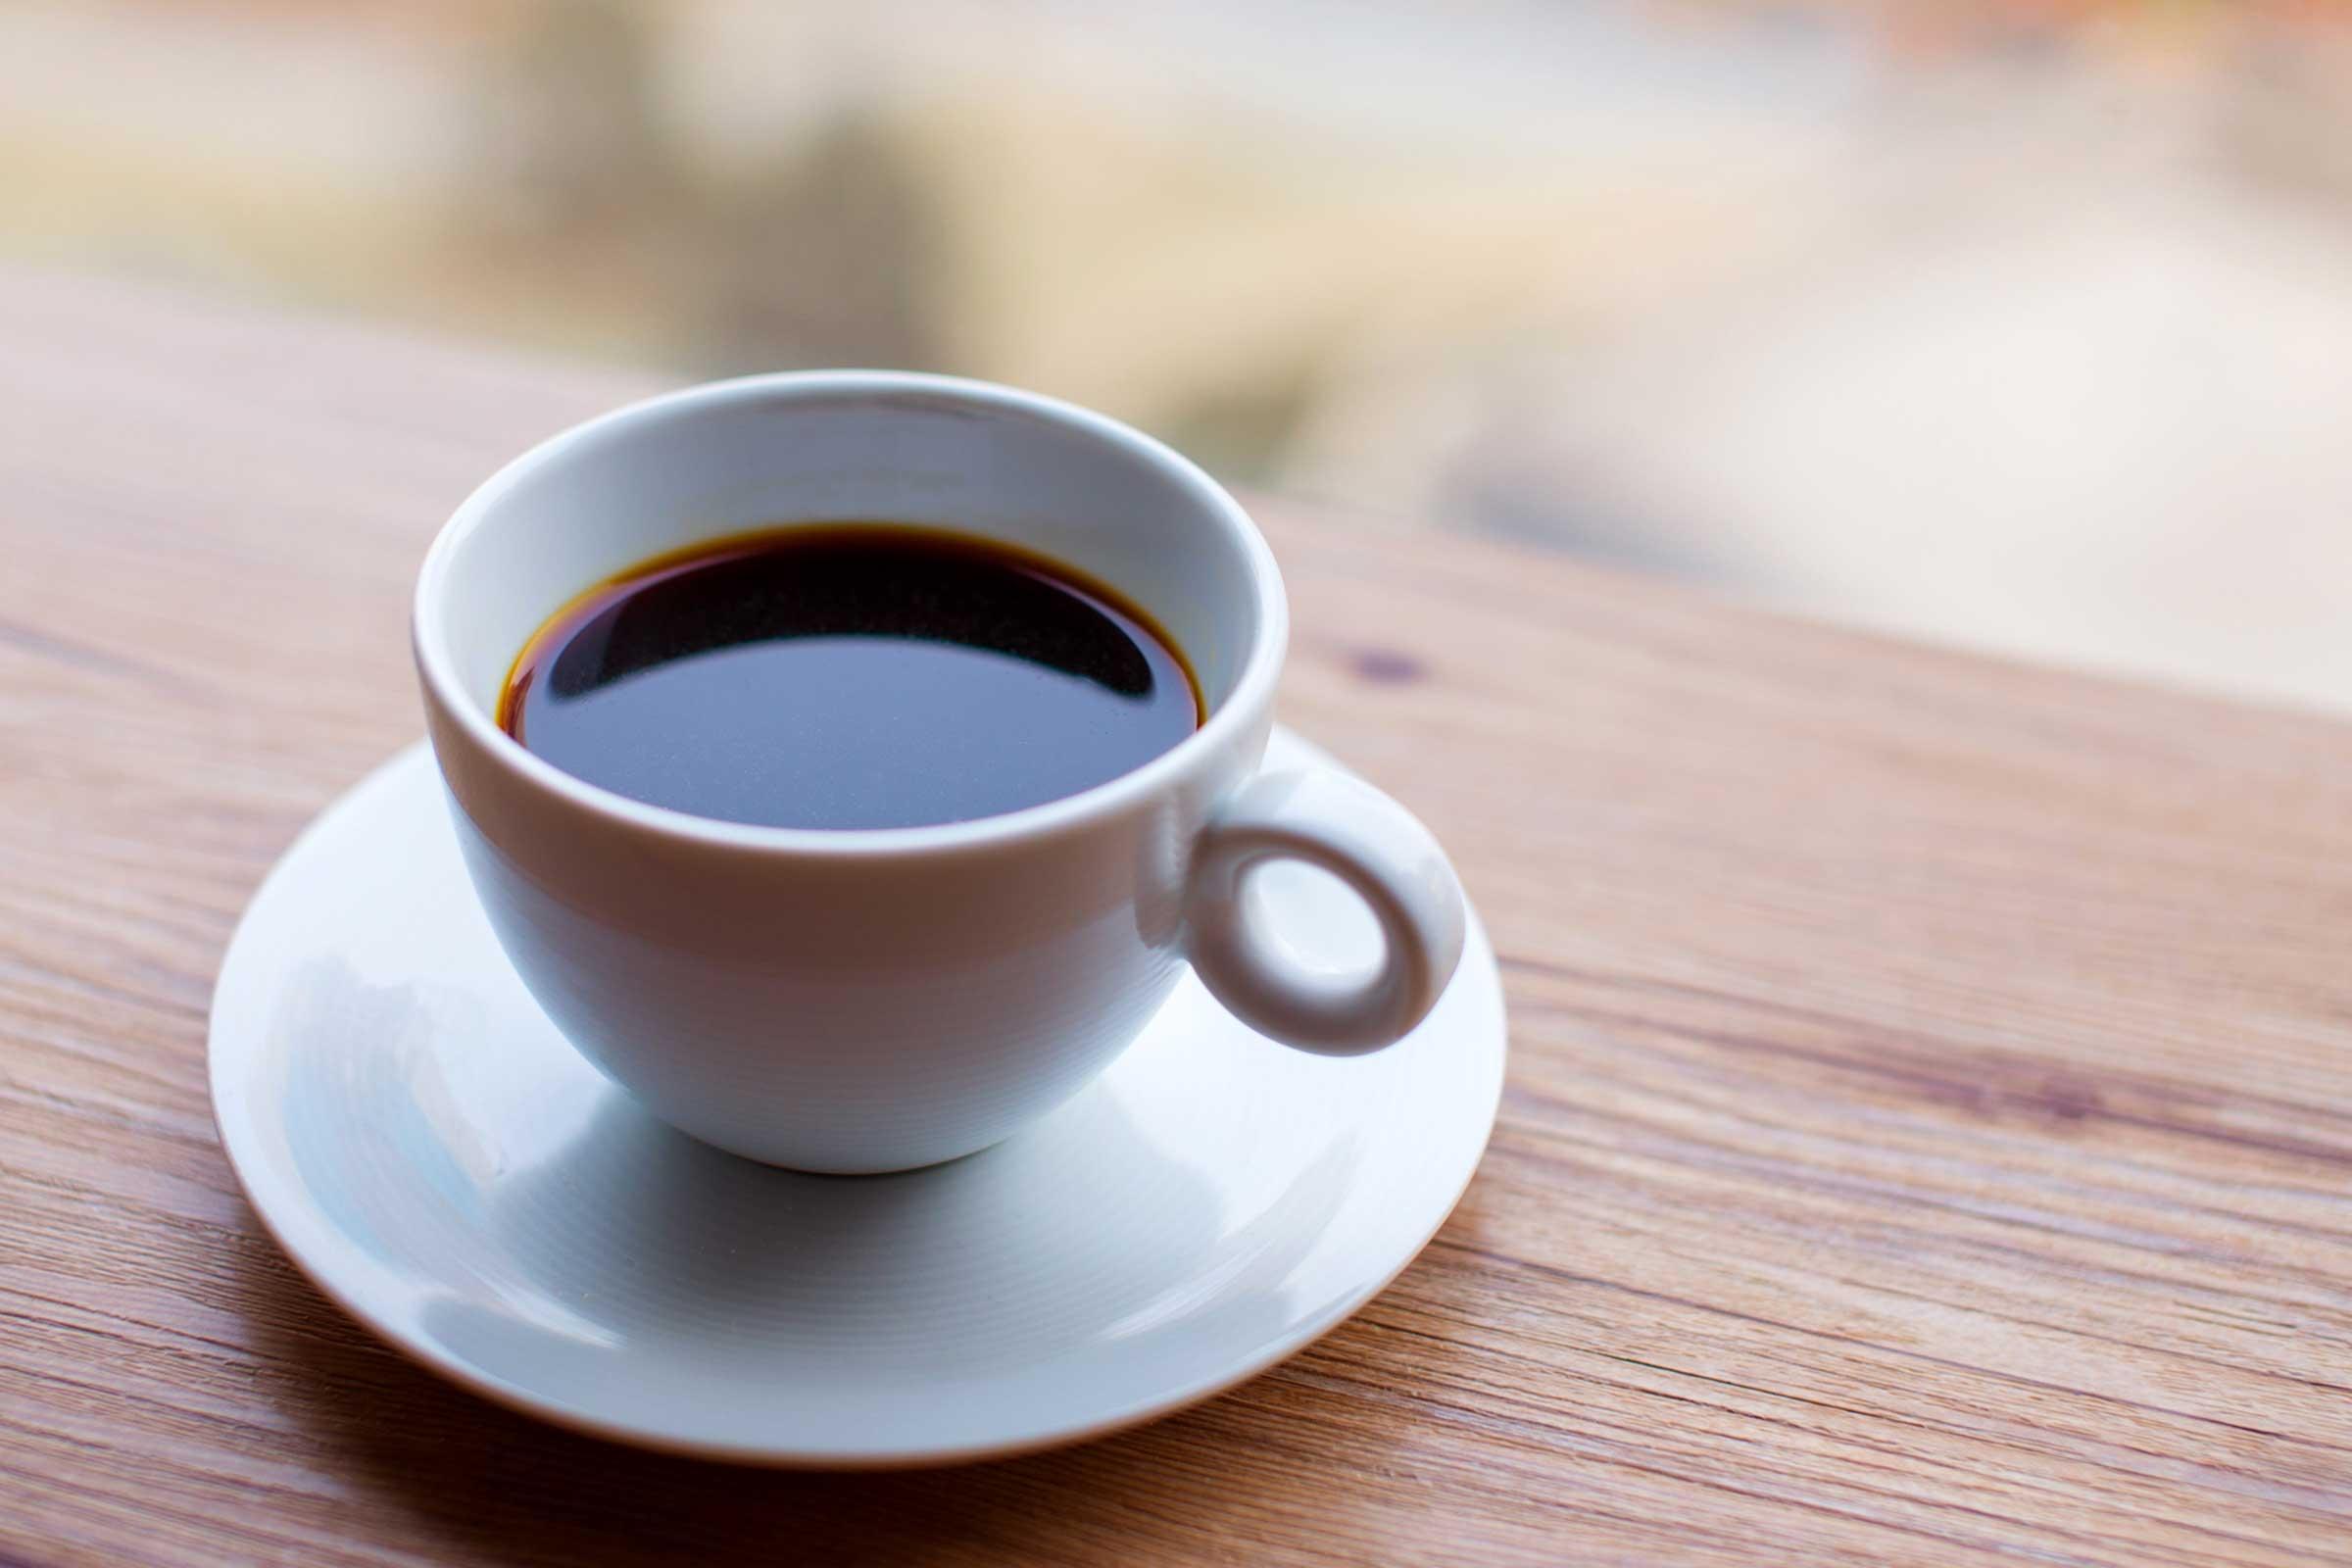 Getting more sleep, drinking coffee may help ease pain